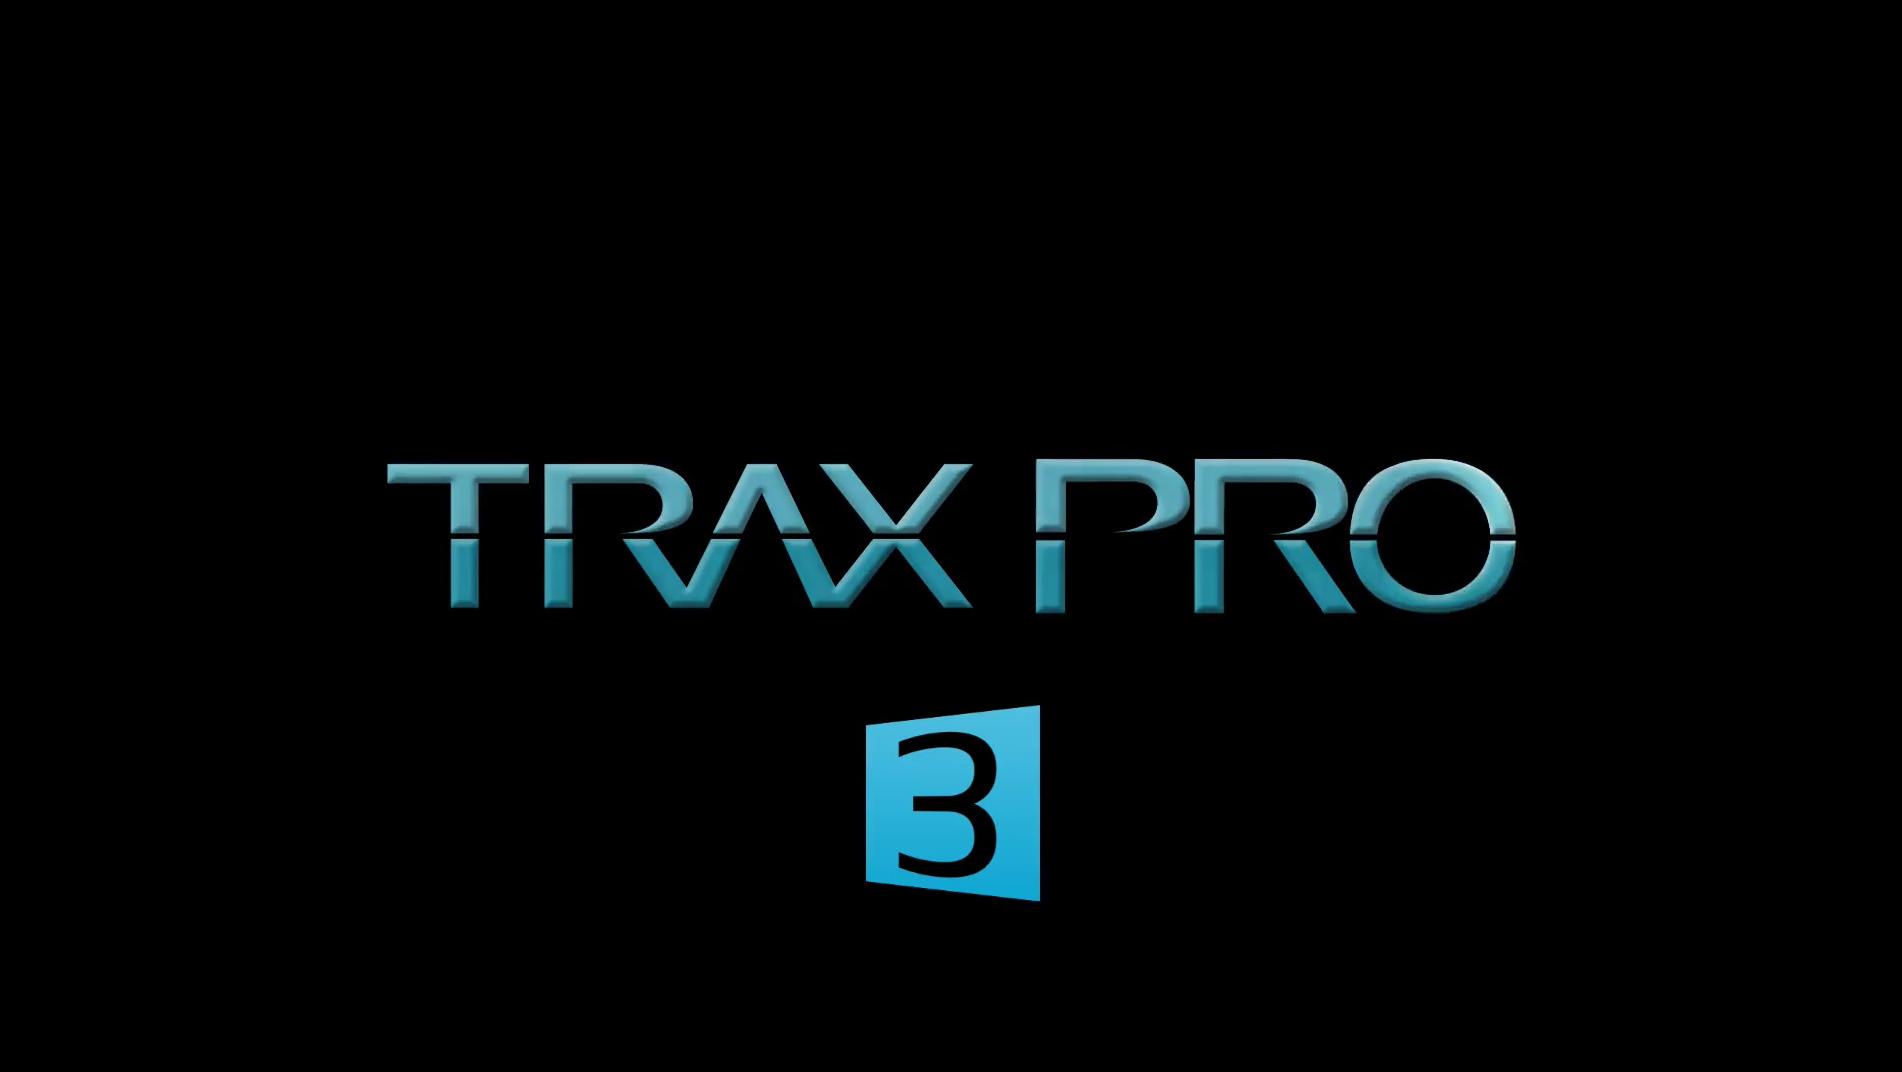 TRAX Pro 3 - Full Tutorial